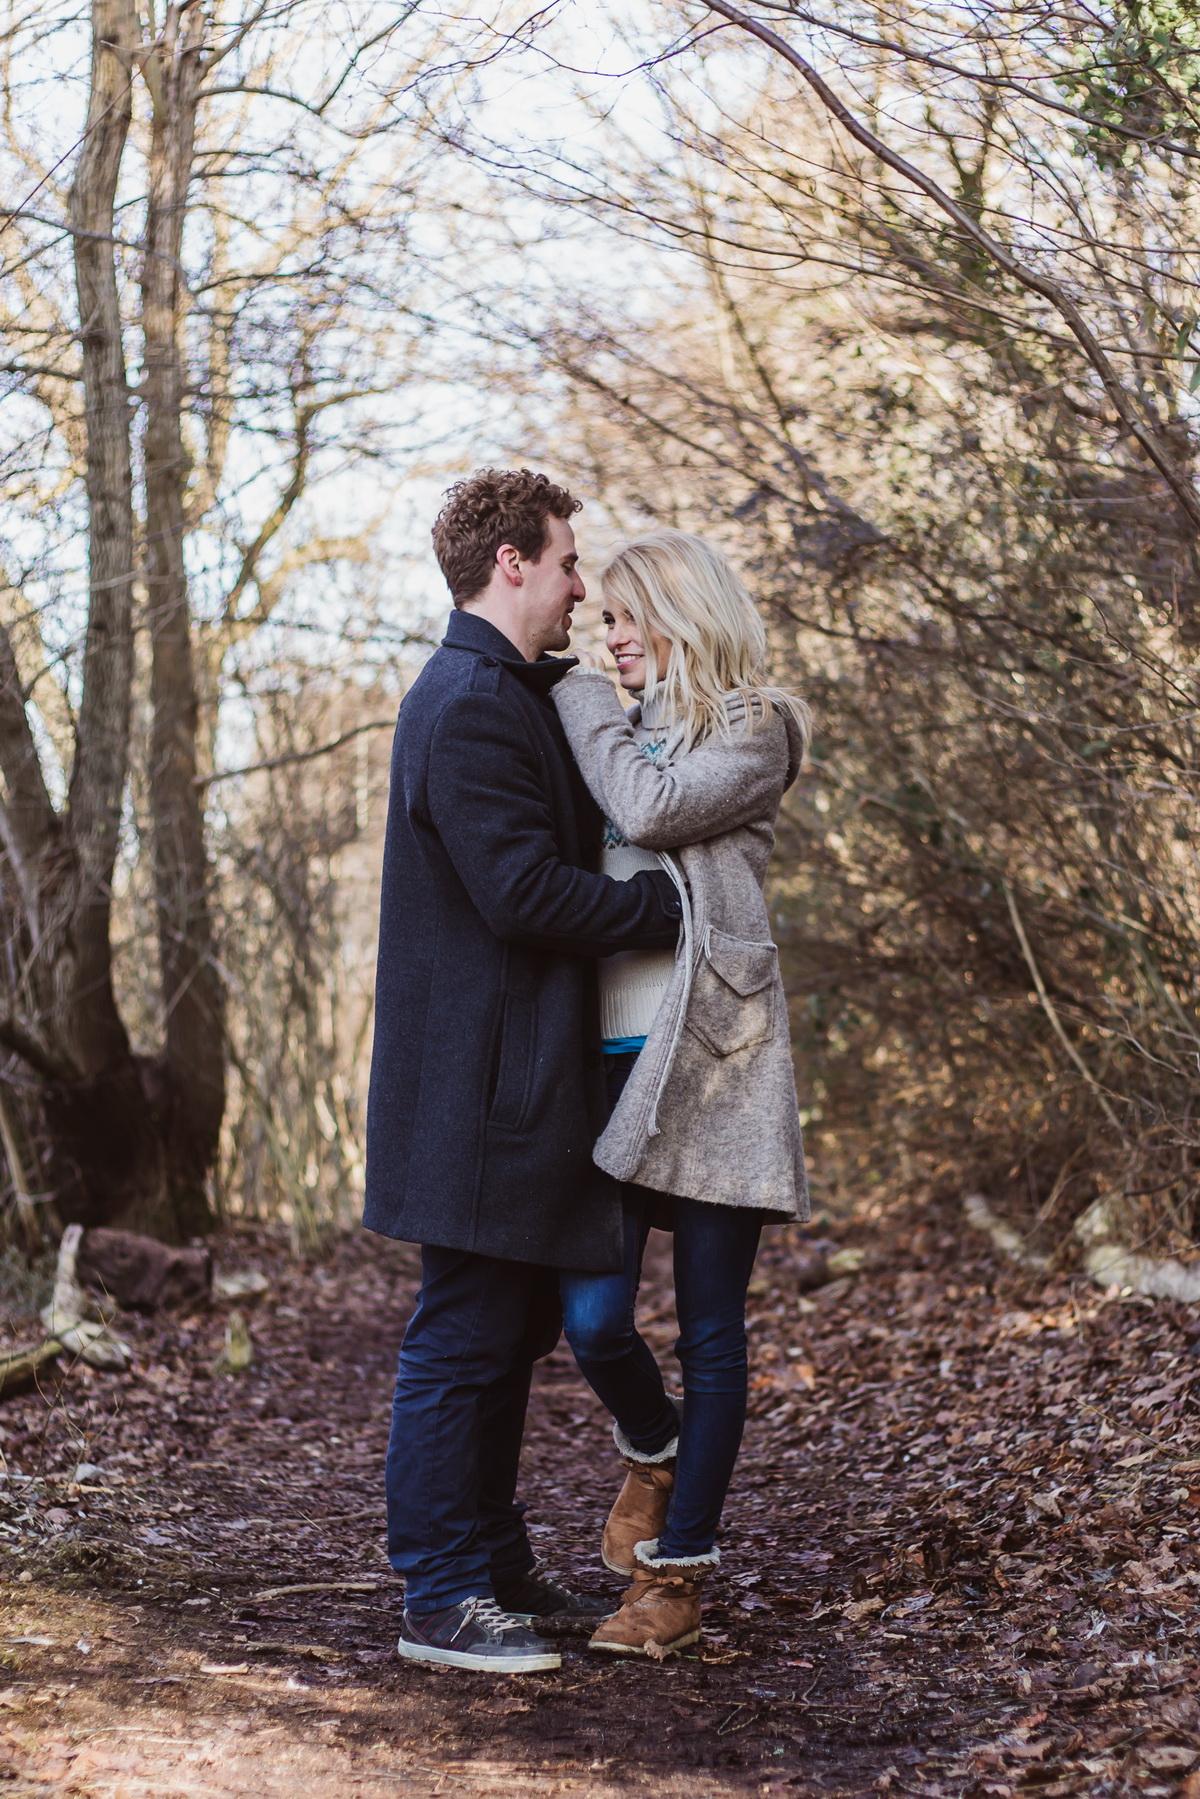 Loveshoot - Julia und Stefan - Claudia Sittig Photography - Lake Ammersee IMG_2803